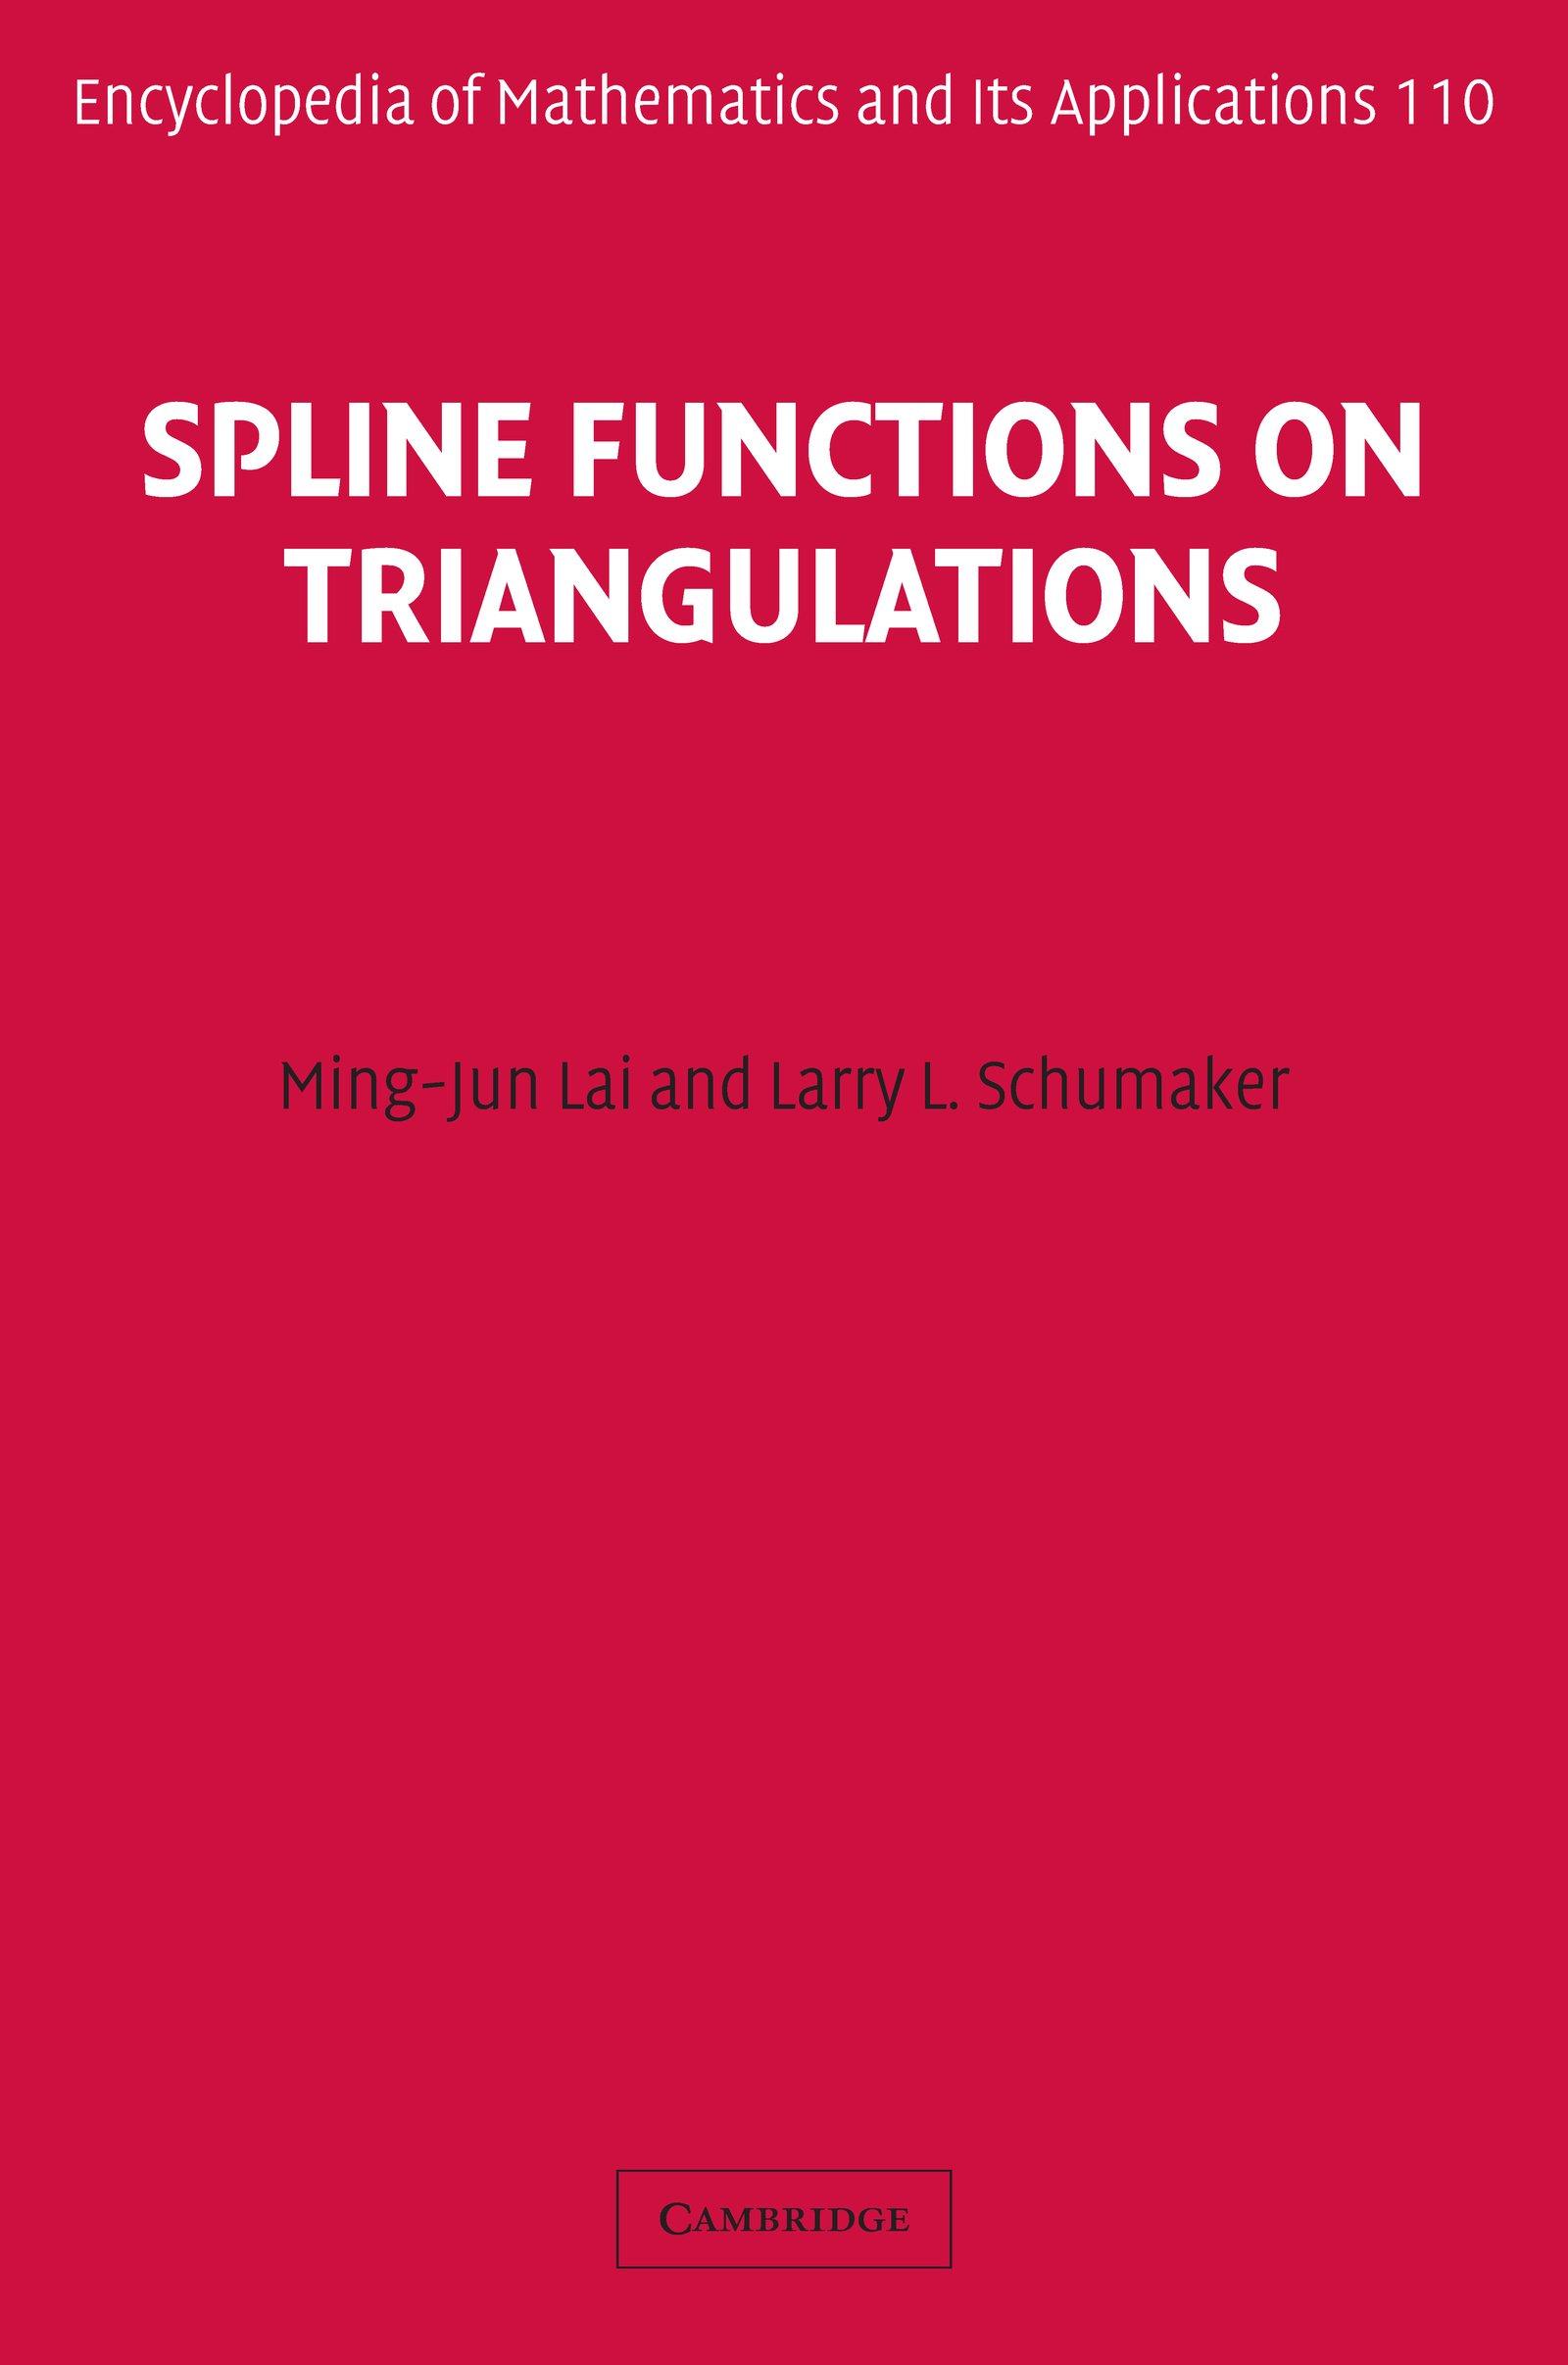 Spline Functions On Triangulations Encyclopedia Of Mathematics And Its Applications Book 110 1 Lai Ming Jun Schumaker Larry L Amazon Com